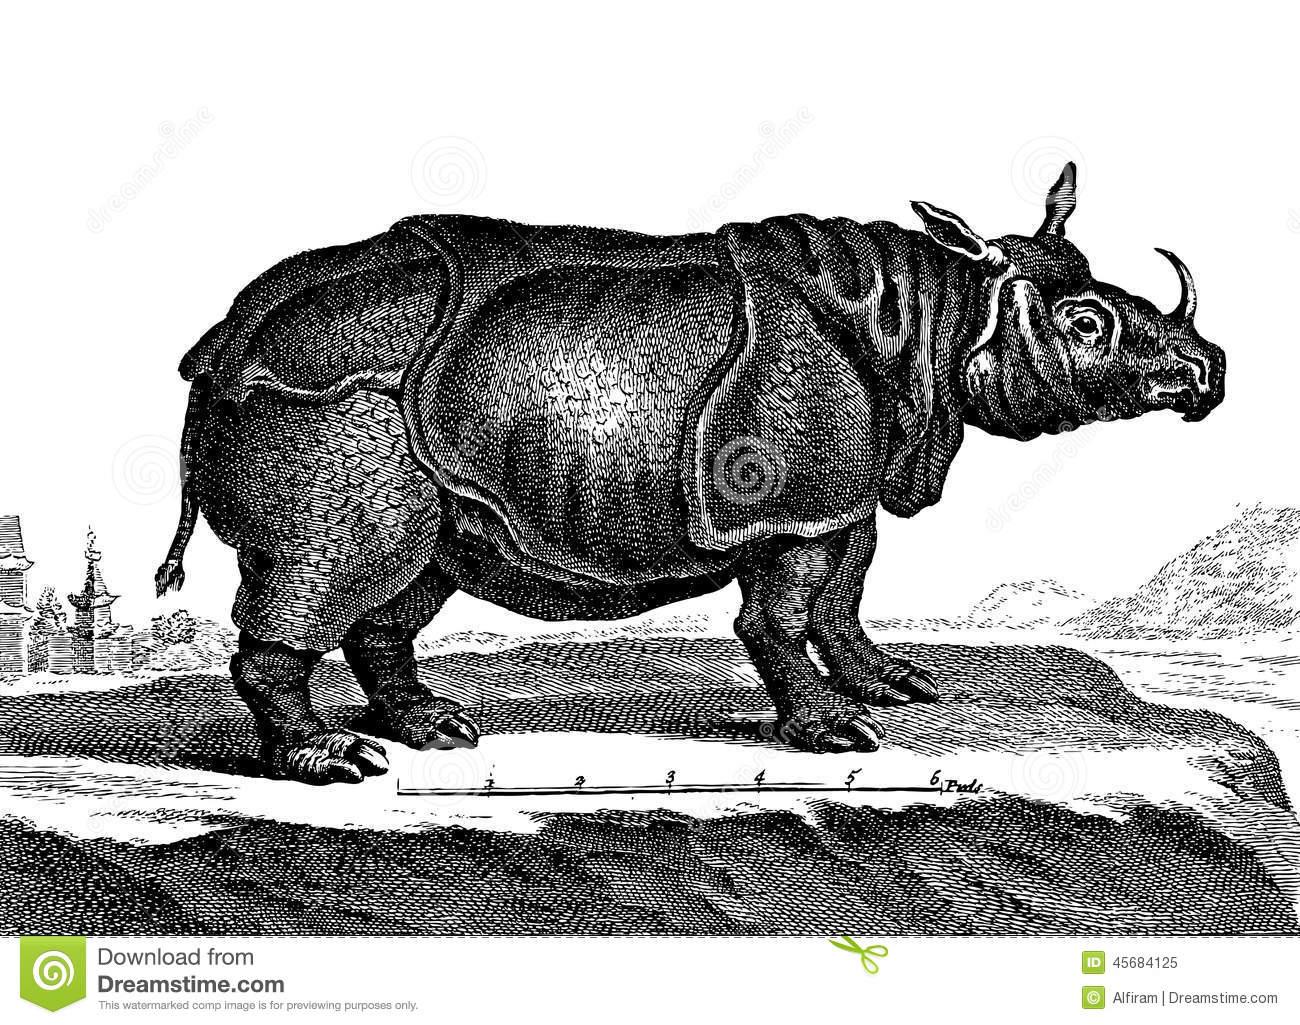 rhino-vintage-engraved-illustration-diderot-d-alembert-encyclopedia-45684125.jpg